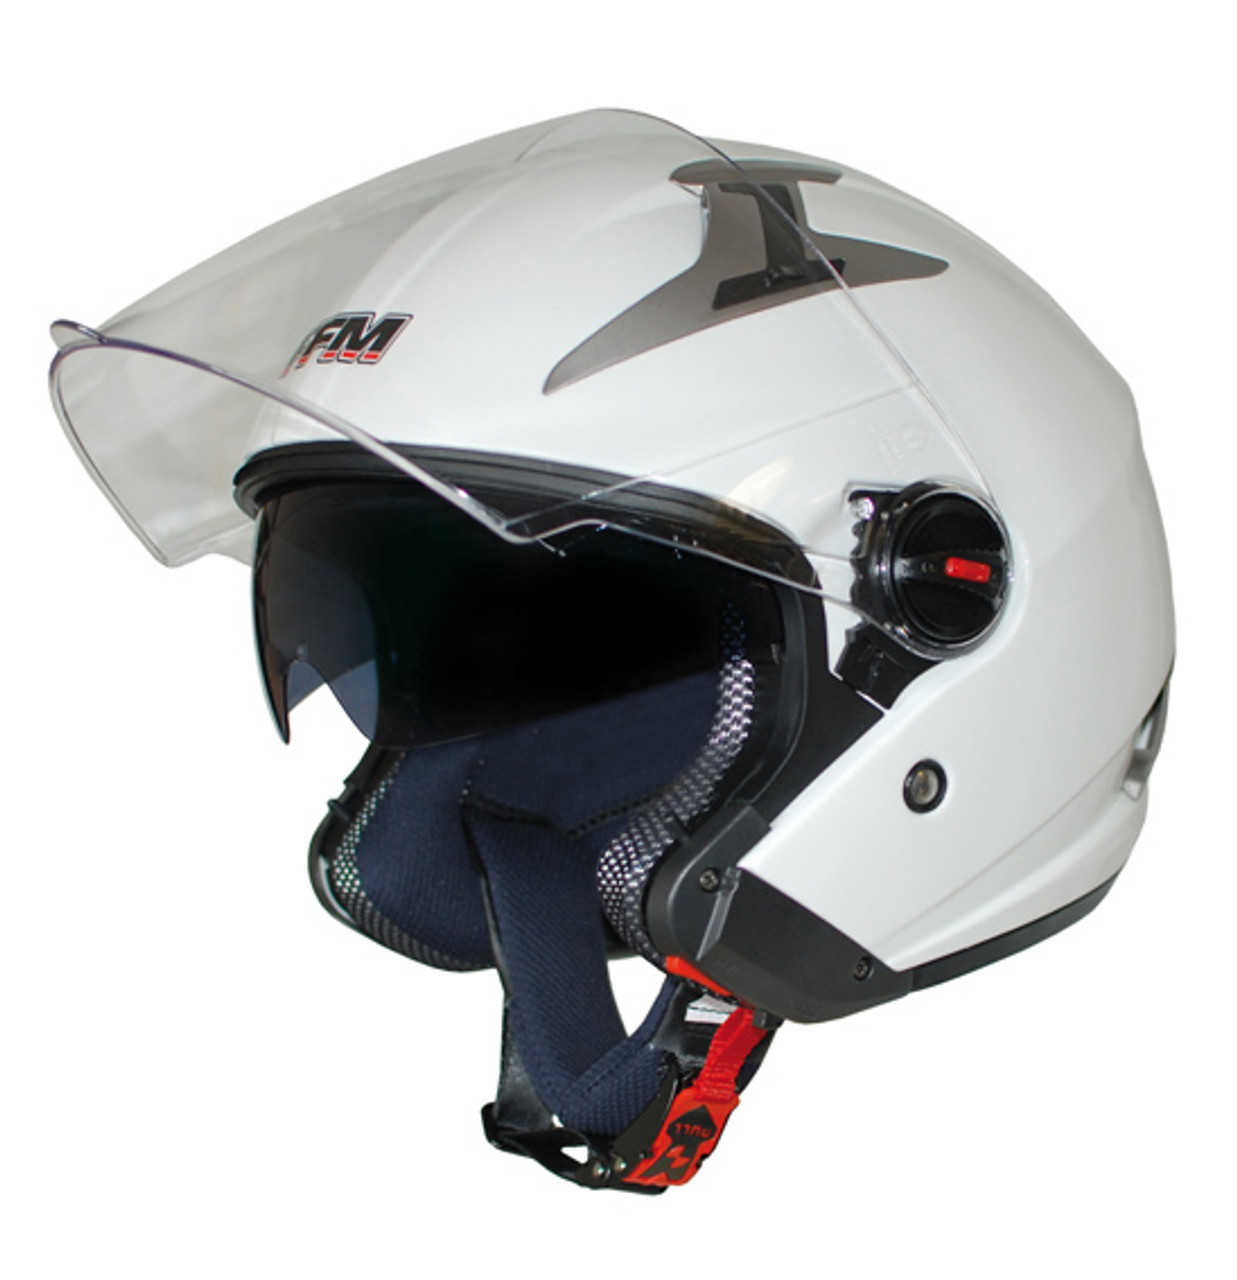 FFM URBAN 3 Modular Helmet, Gloss White (XS 54cm) - CLOSEOUT SALE